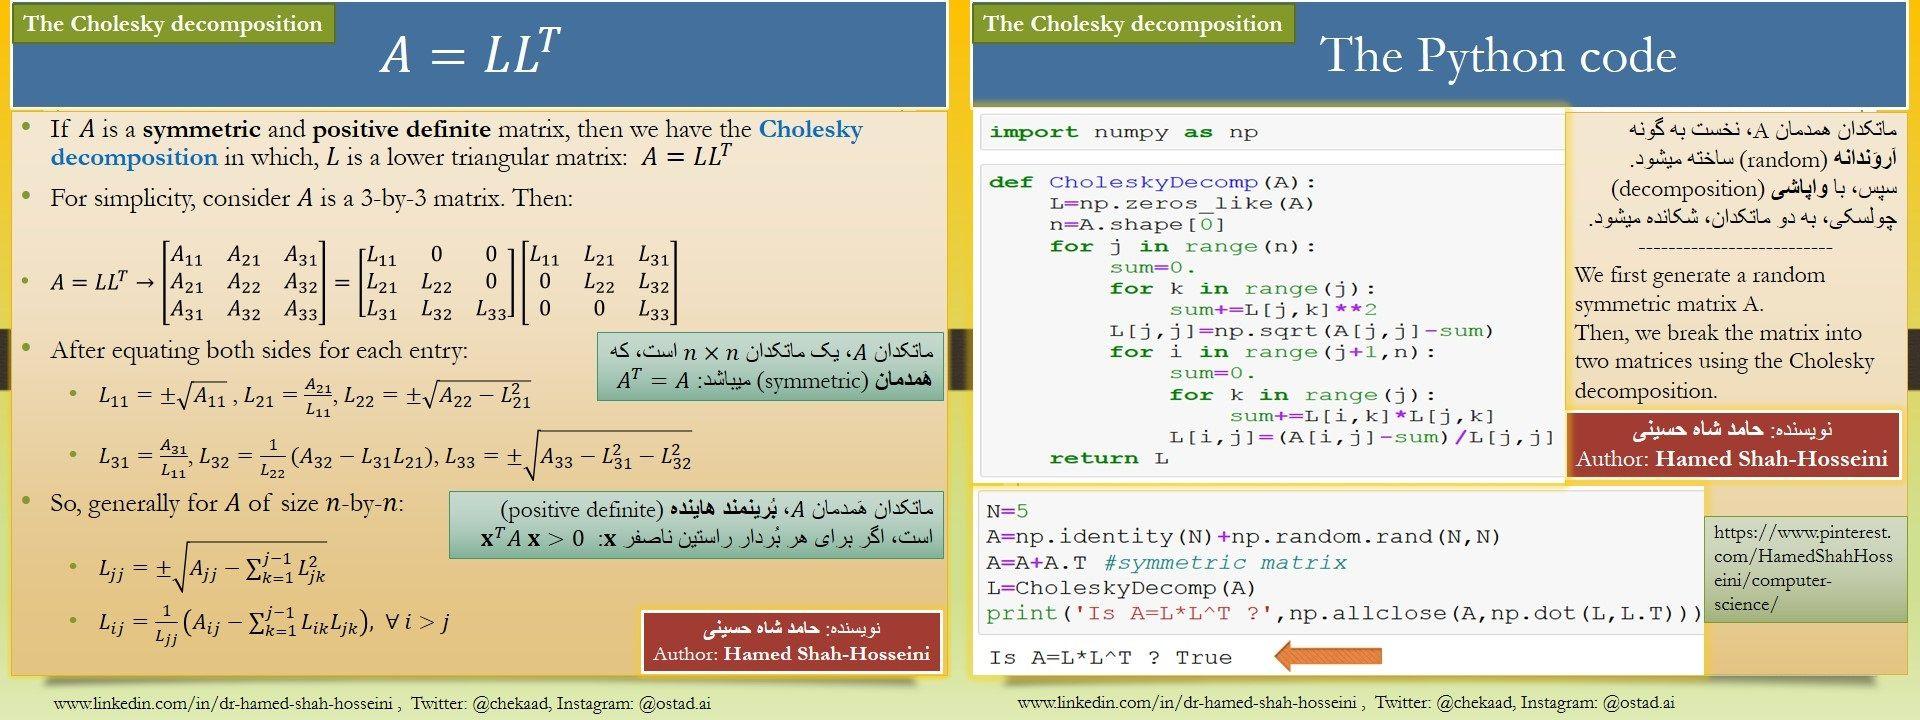 The Cholesky Decomposition The Algorithm And The Code Coding Algorithm Computer Science [ 720 x 1920 Pixel ]